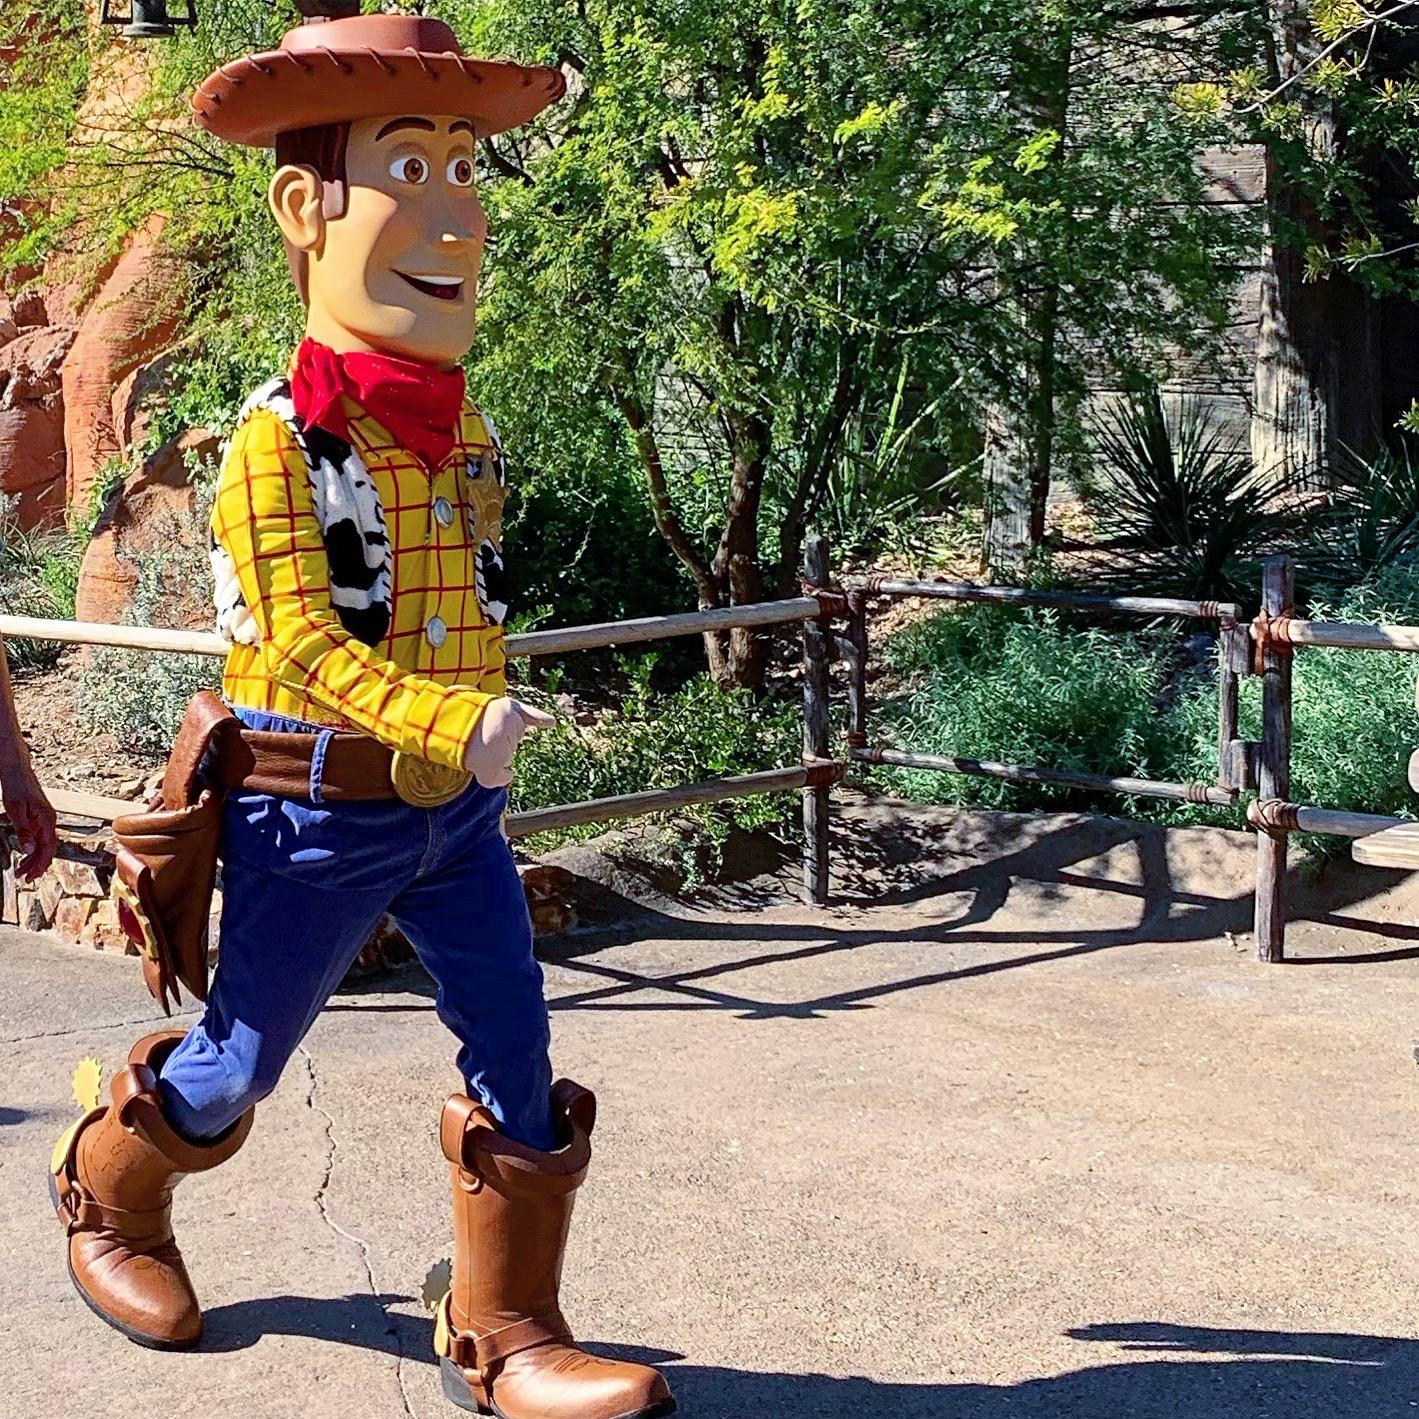 Woody walking on the streets of Disneyland Anaheim California